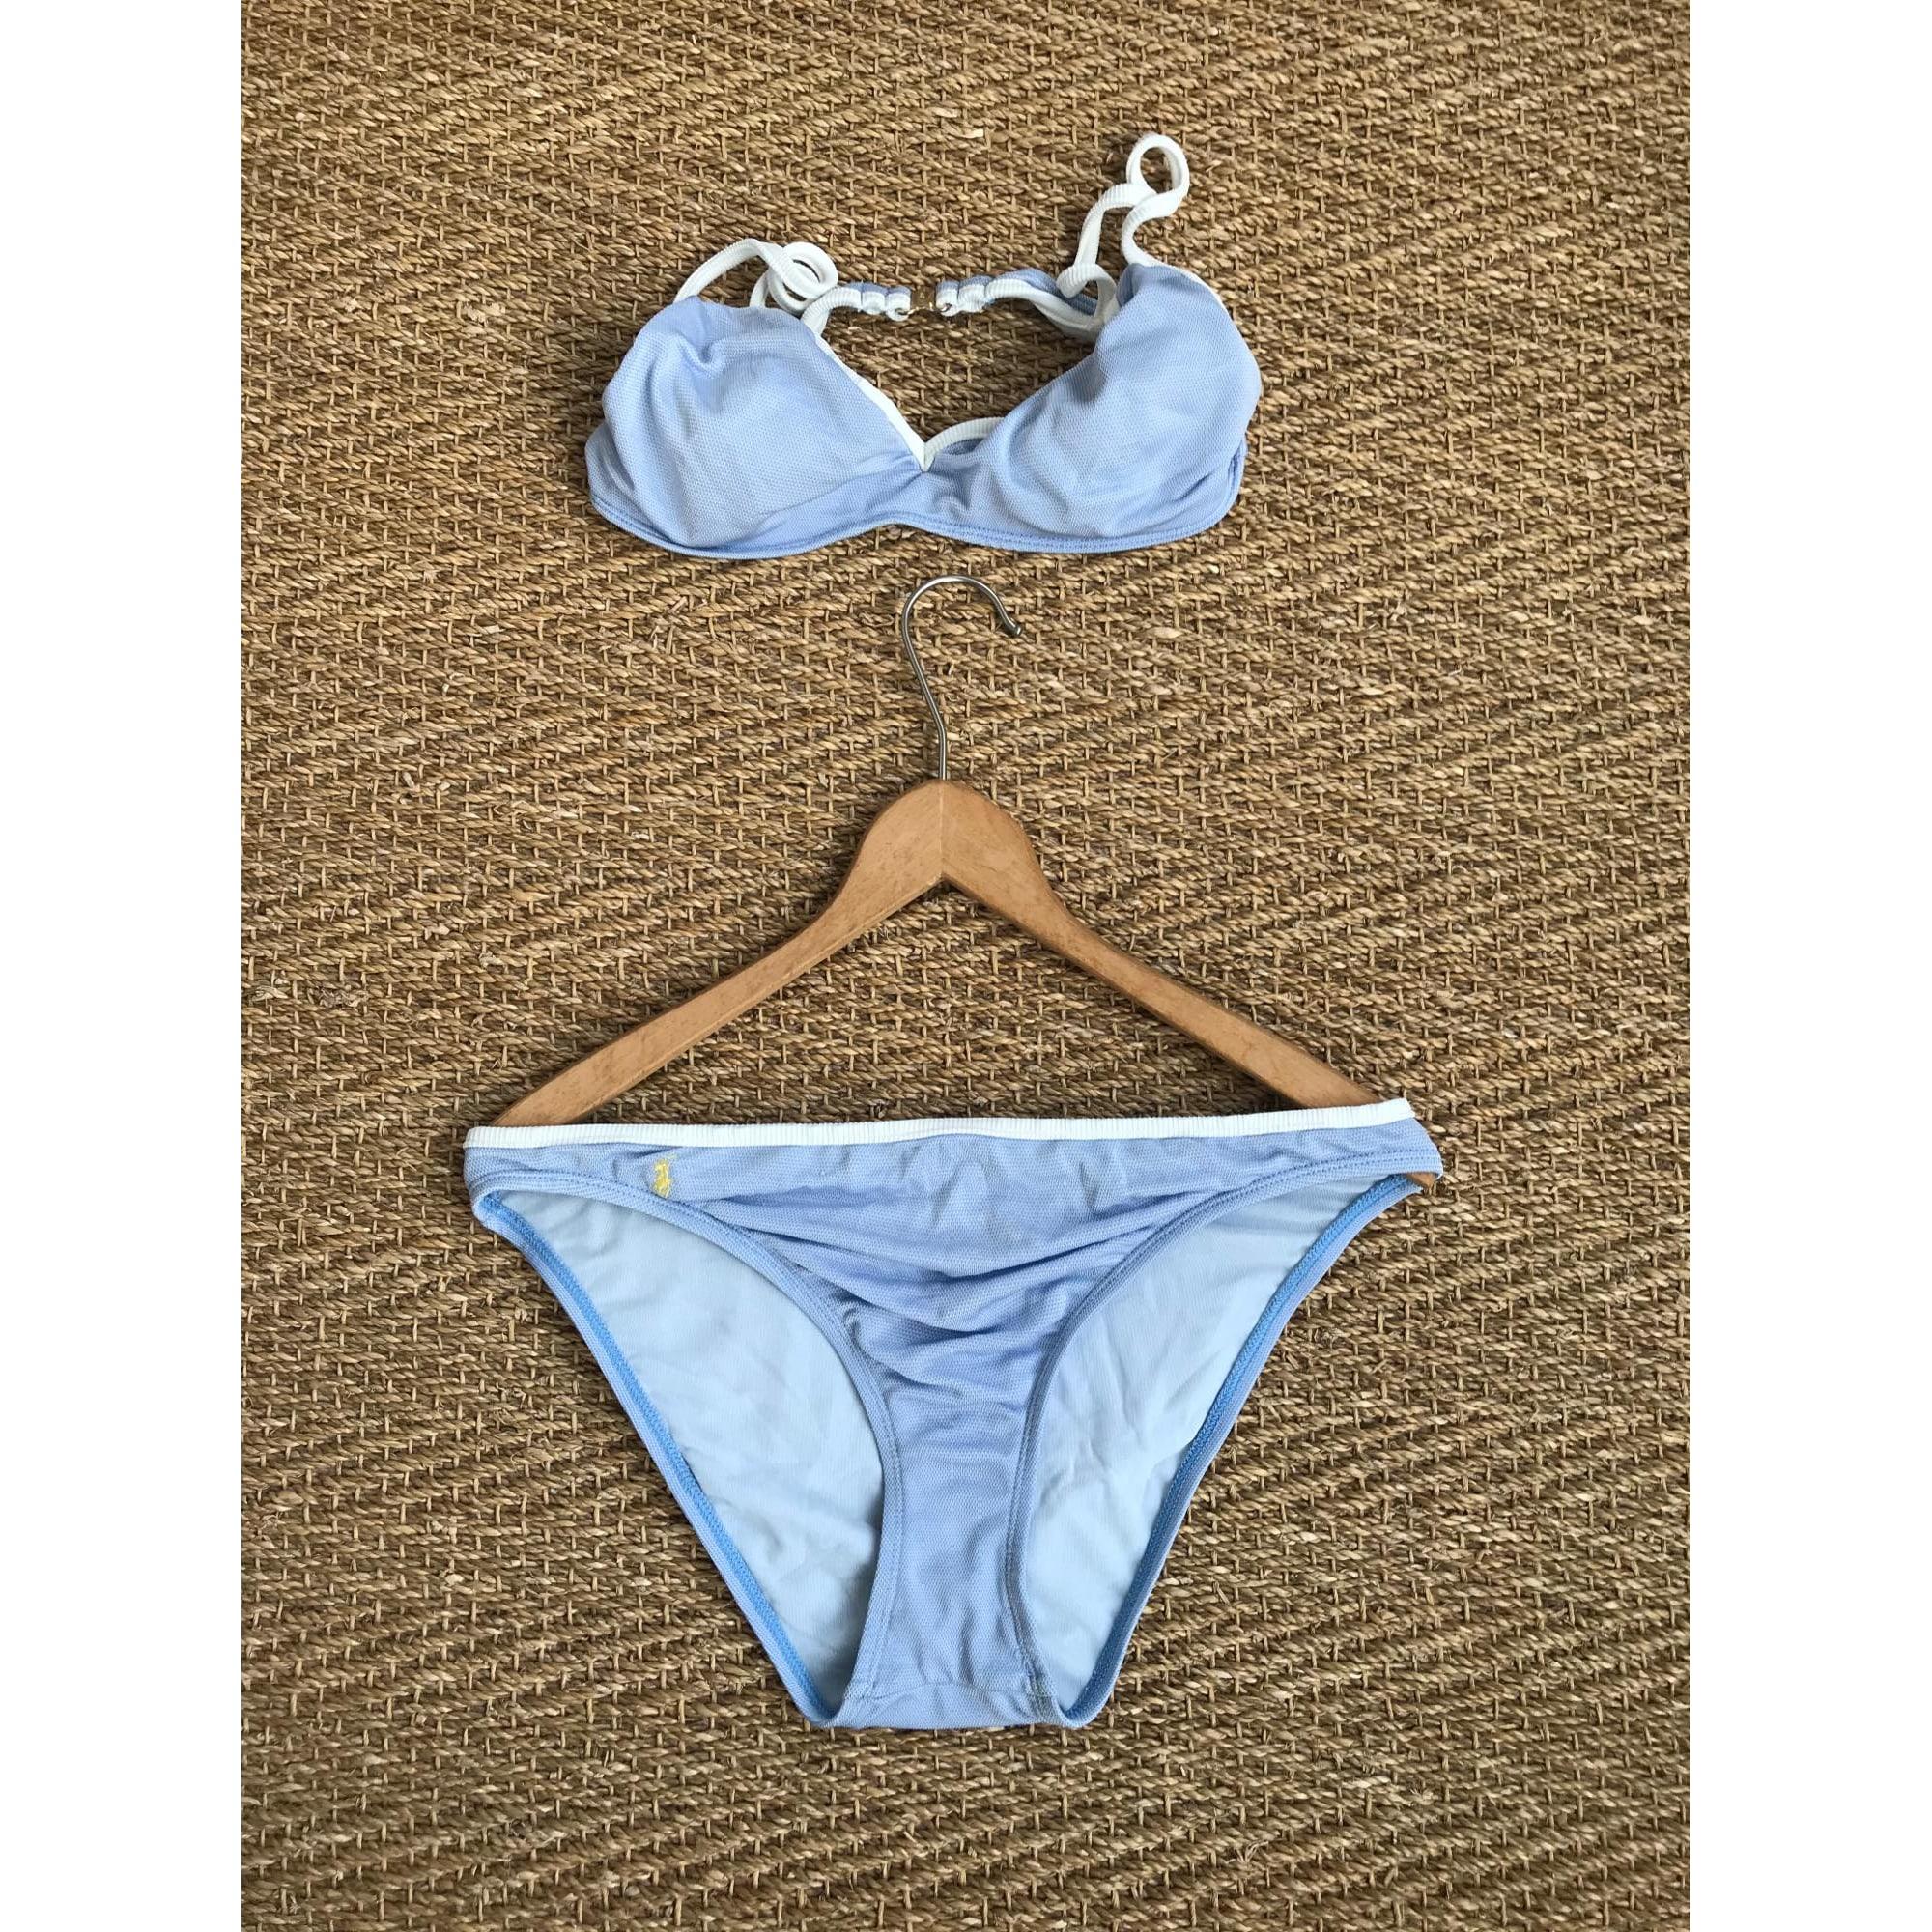 Maillot de bain deux-pièces RALPH LAUREN Bleu, bleu marine, bleu turquoise